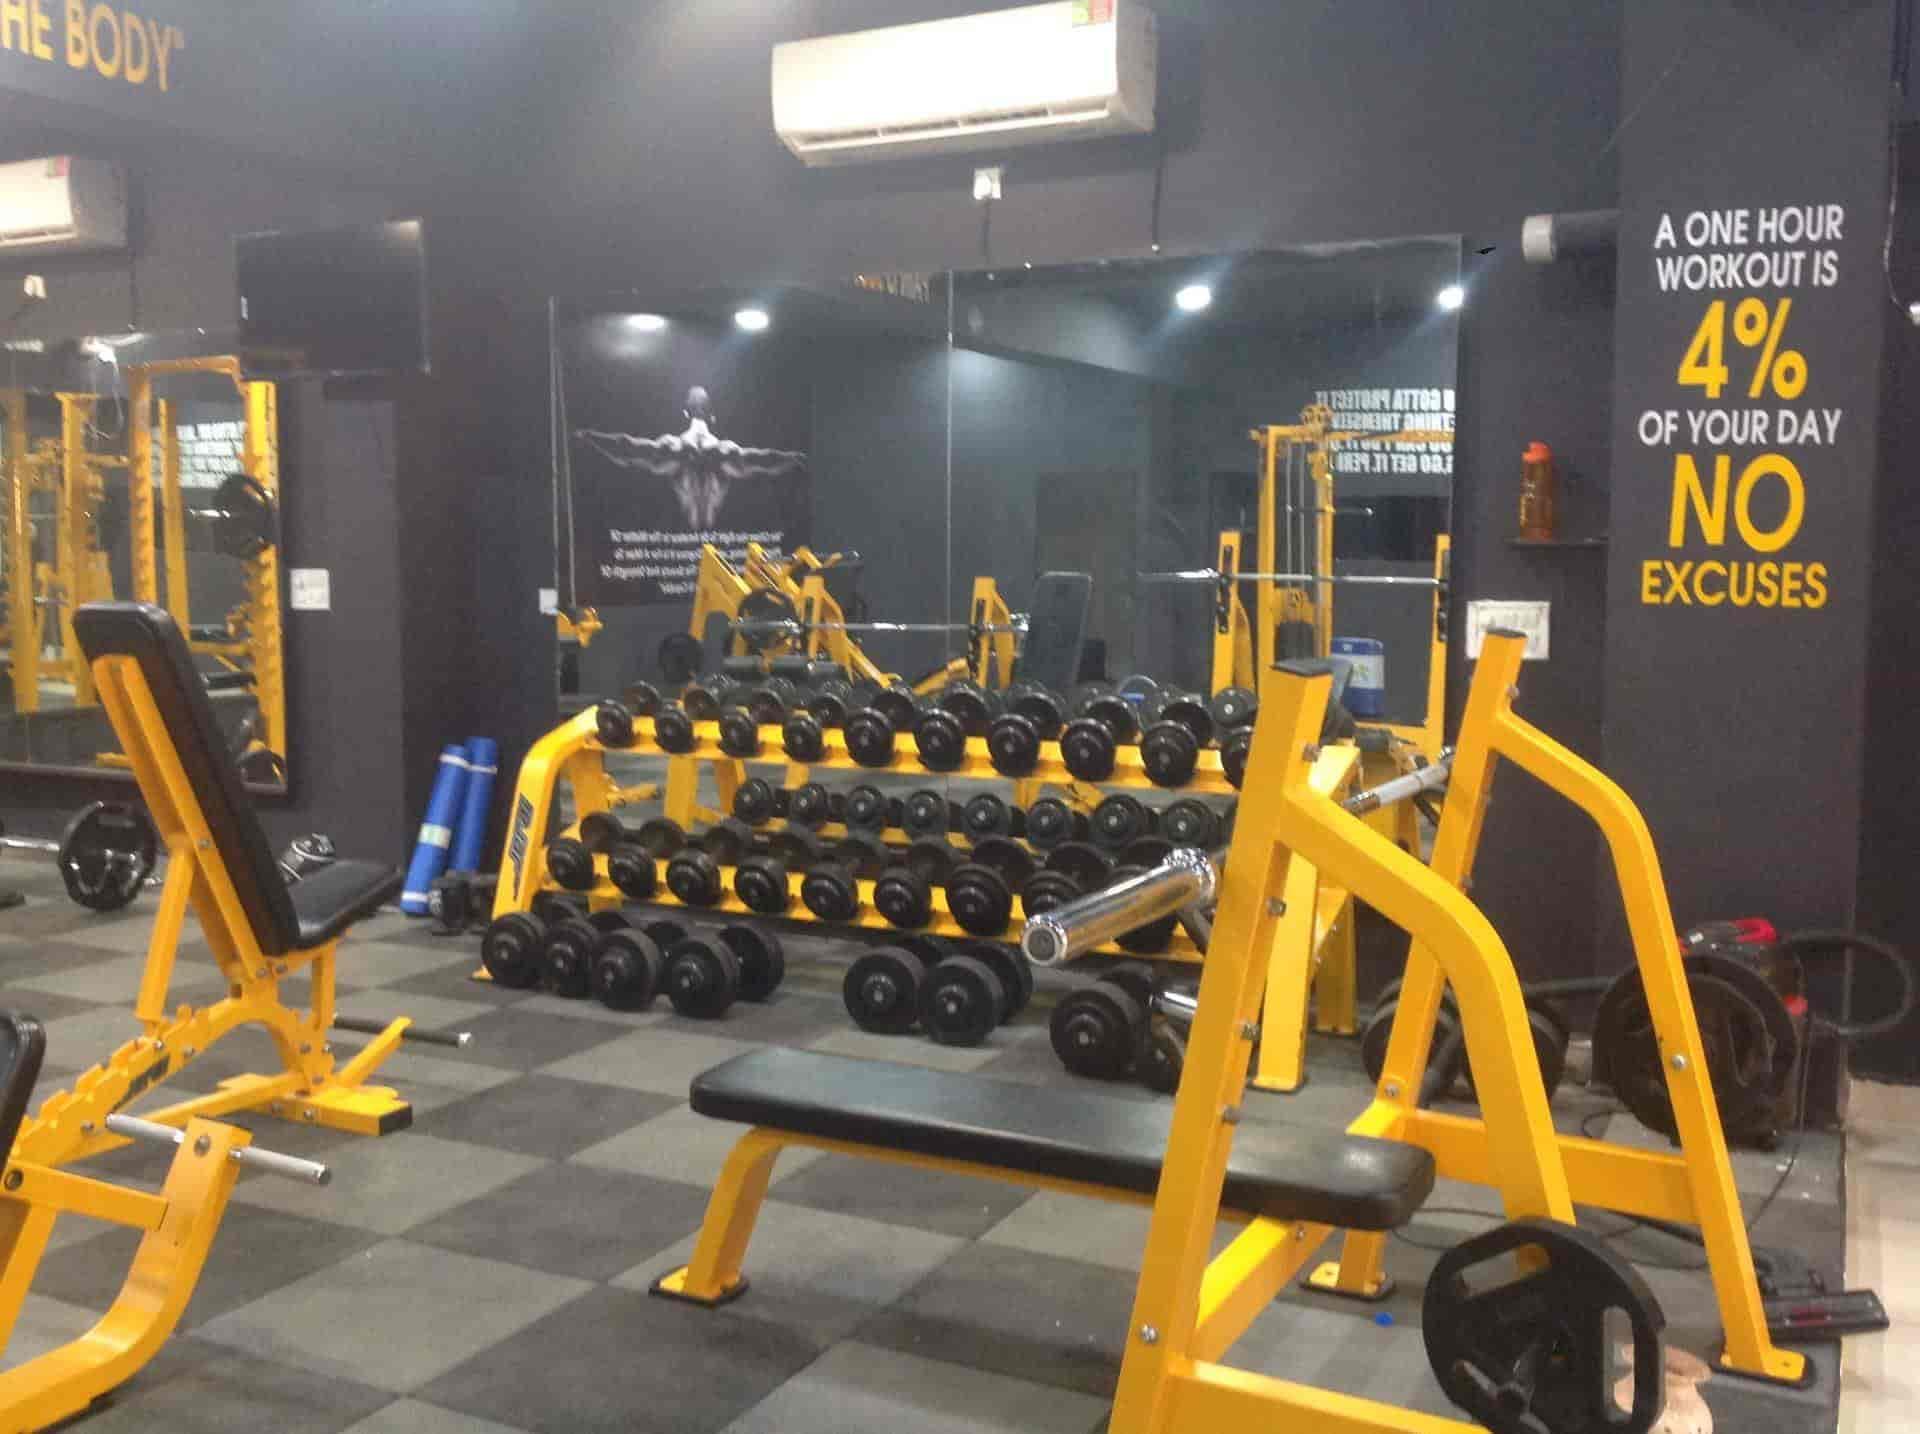 Fitness garage gym nanakheda gyms in ujjain justdial